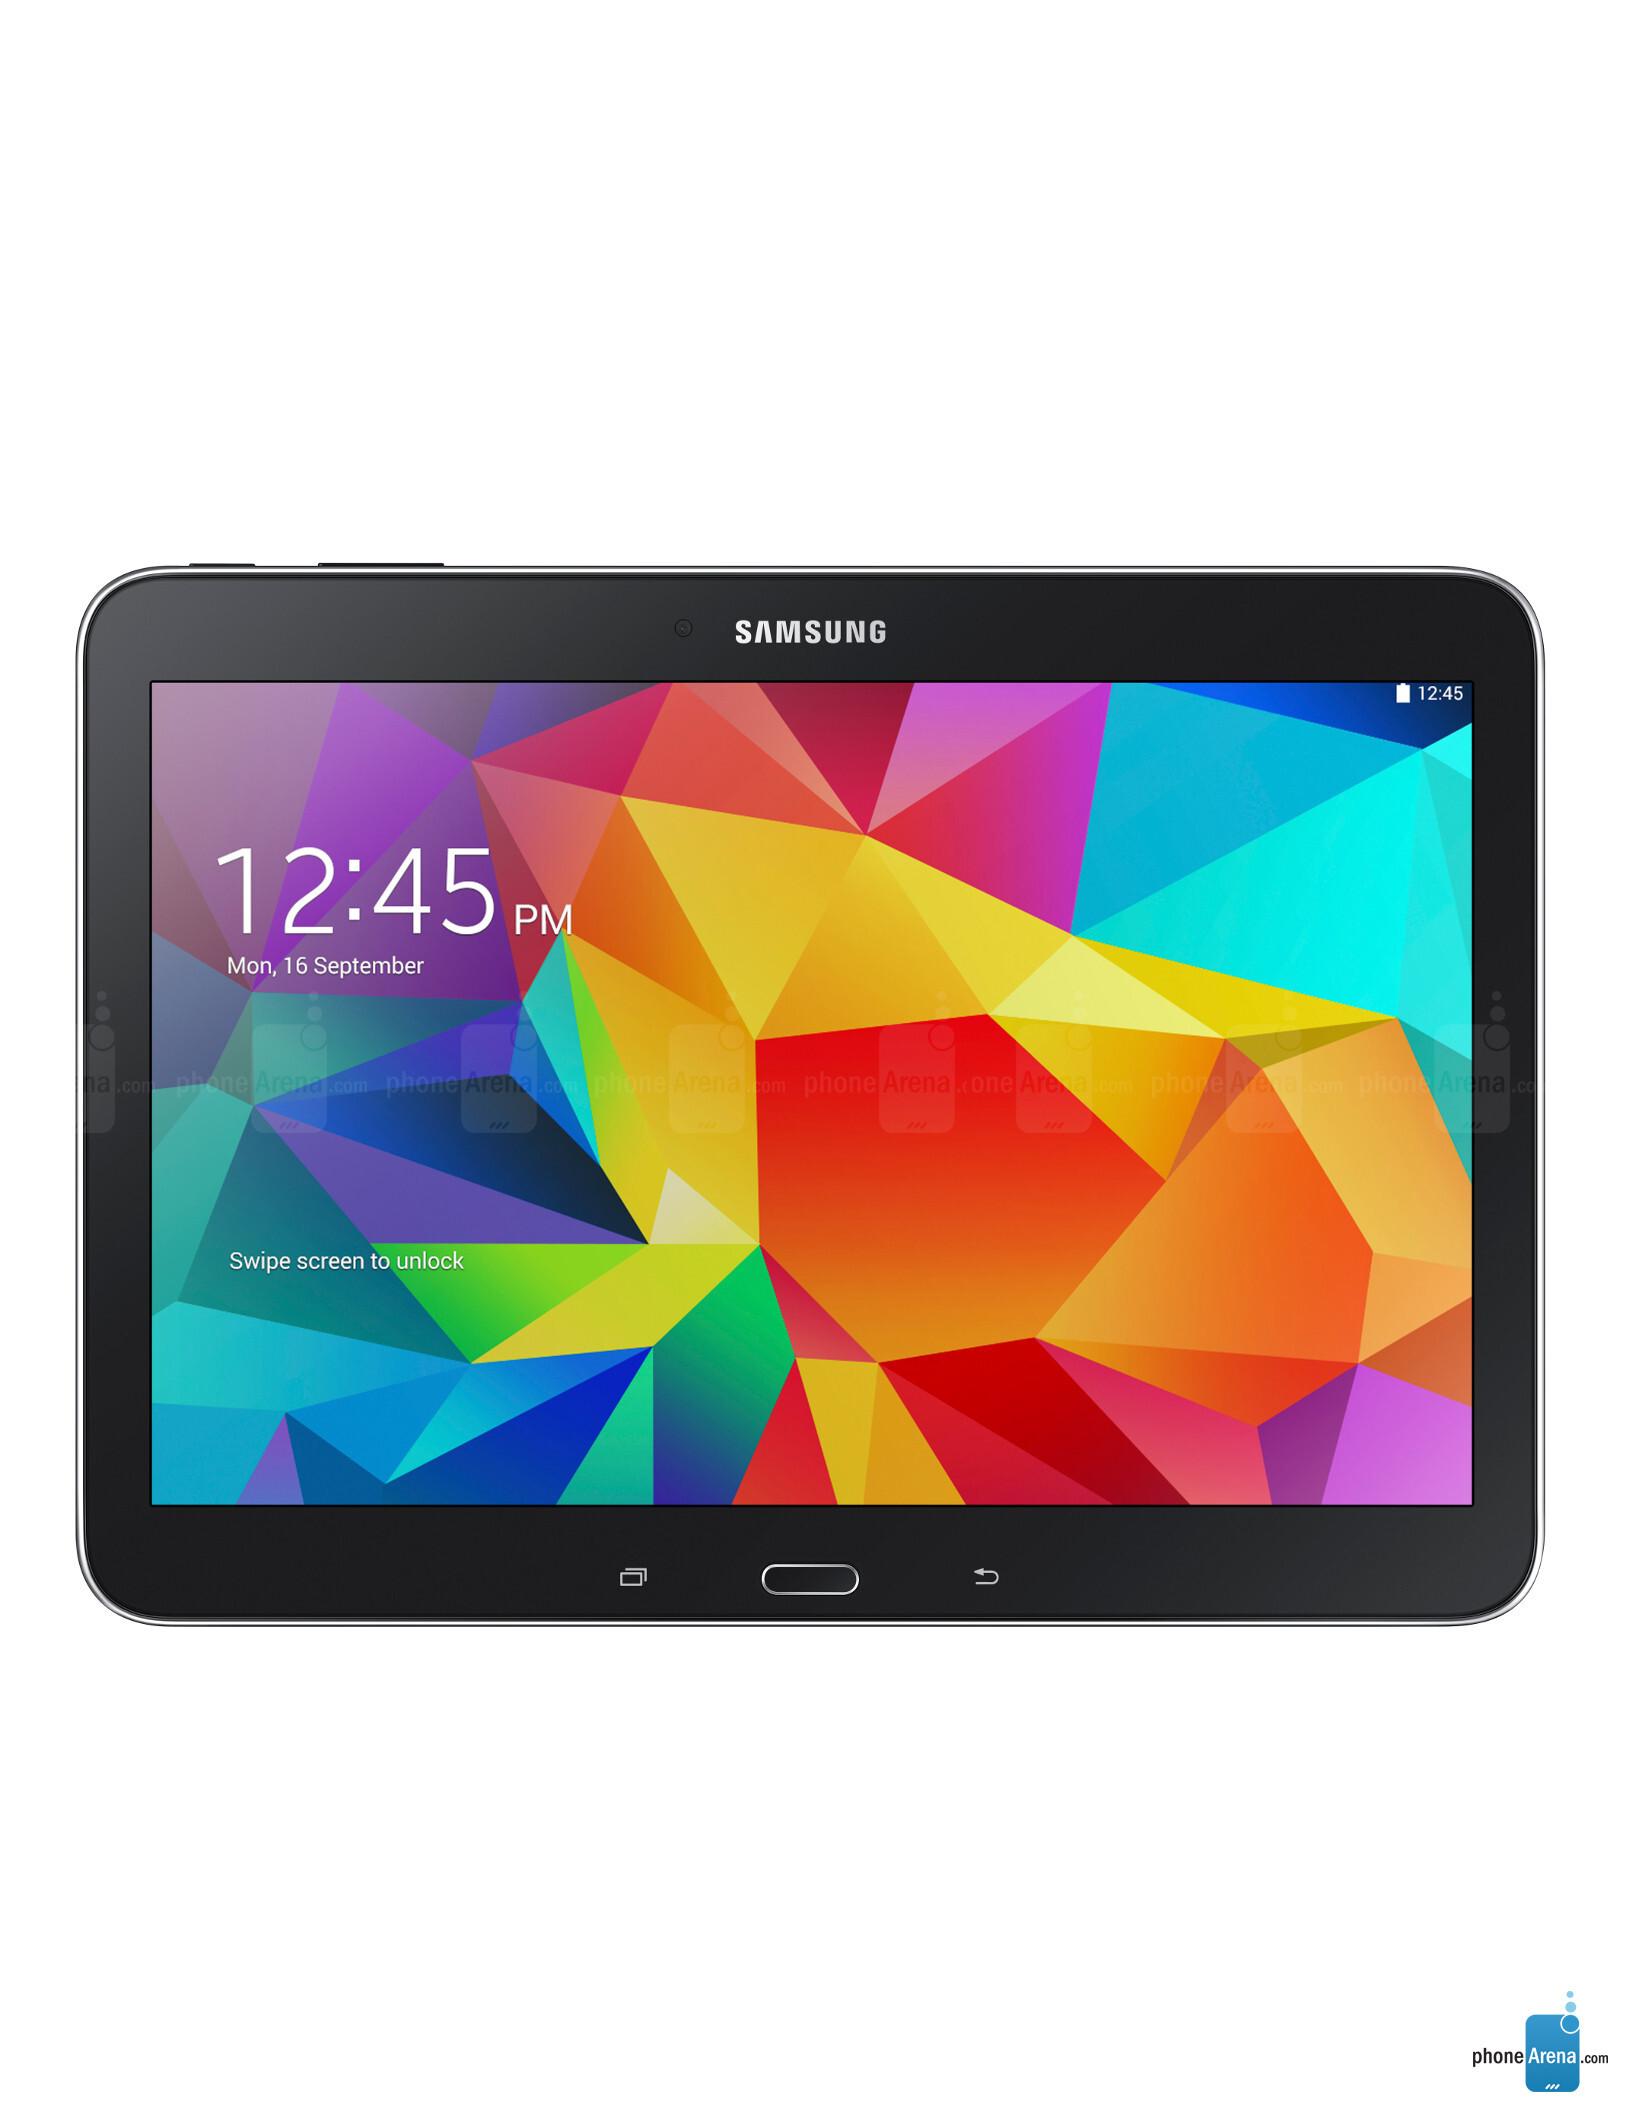 Samsung Galaxy Tab 4 10.1 specs